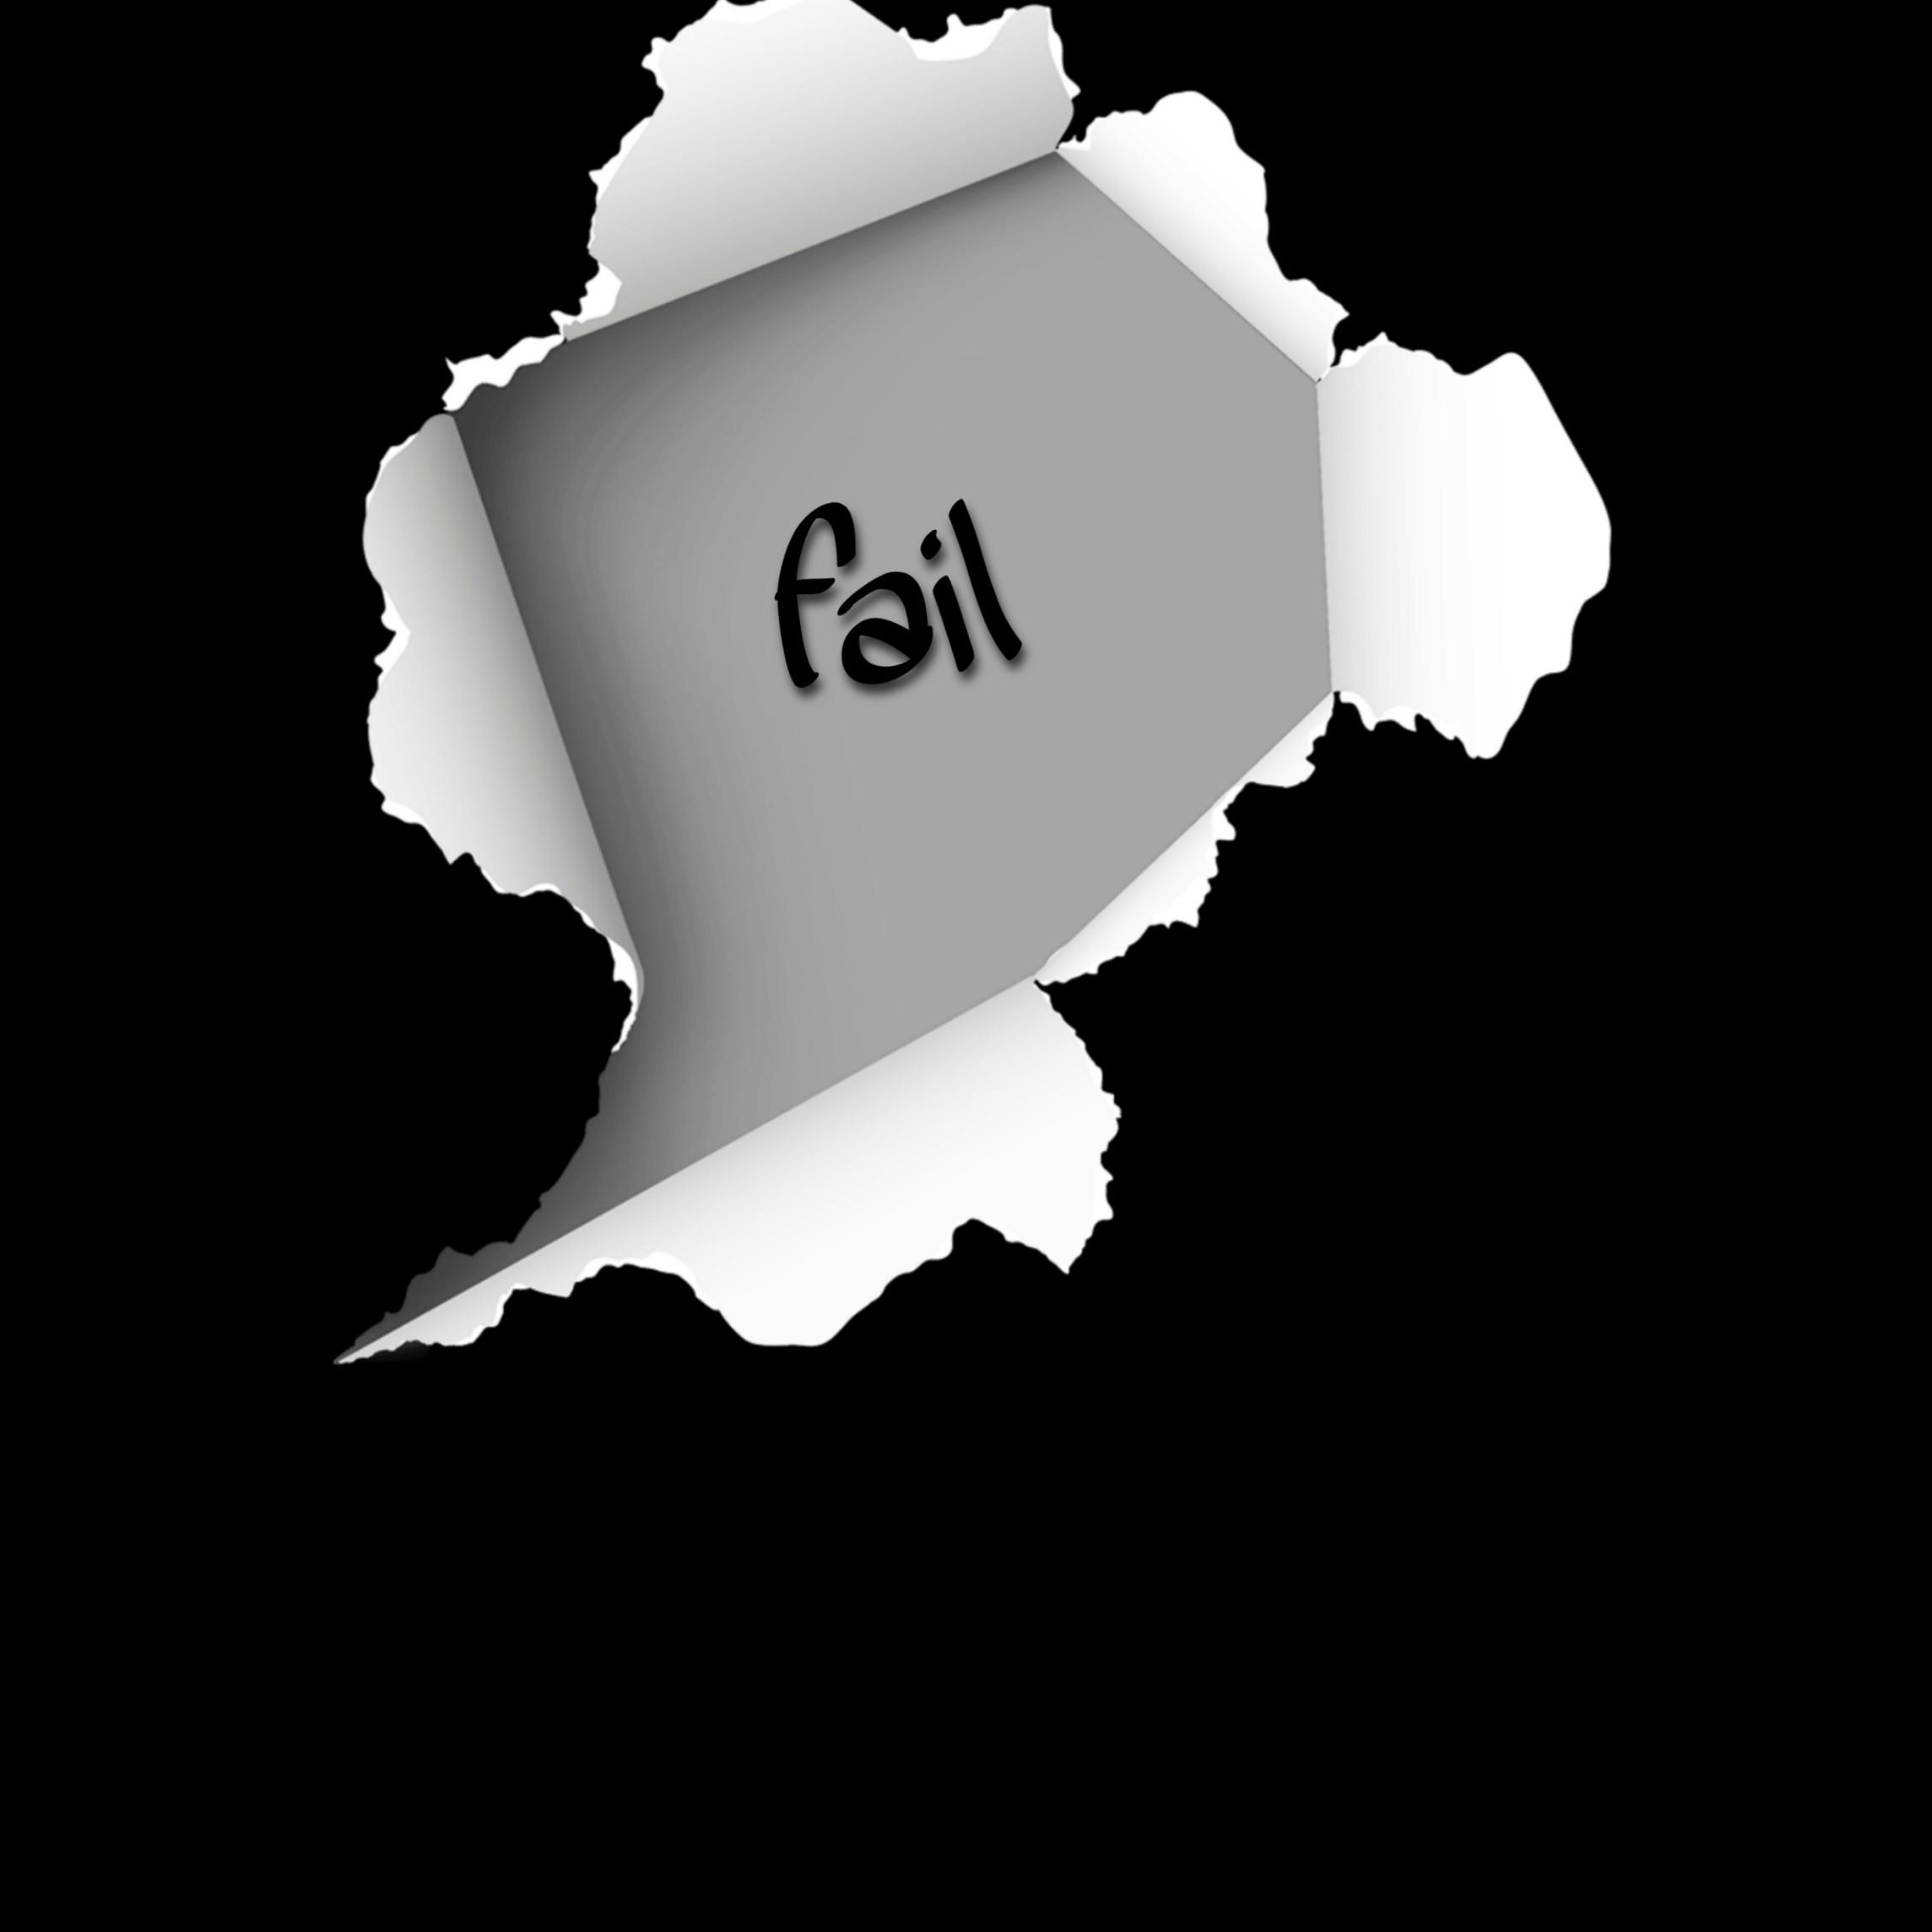 Failure 2020